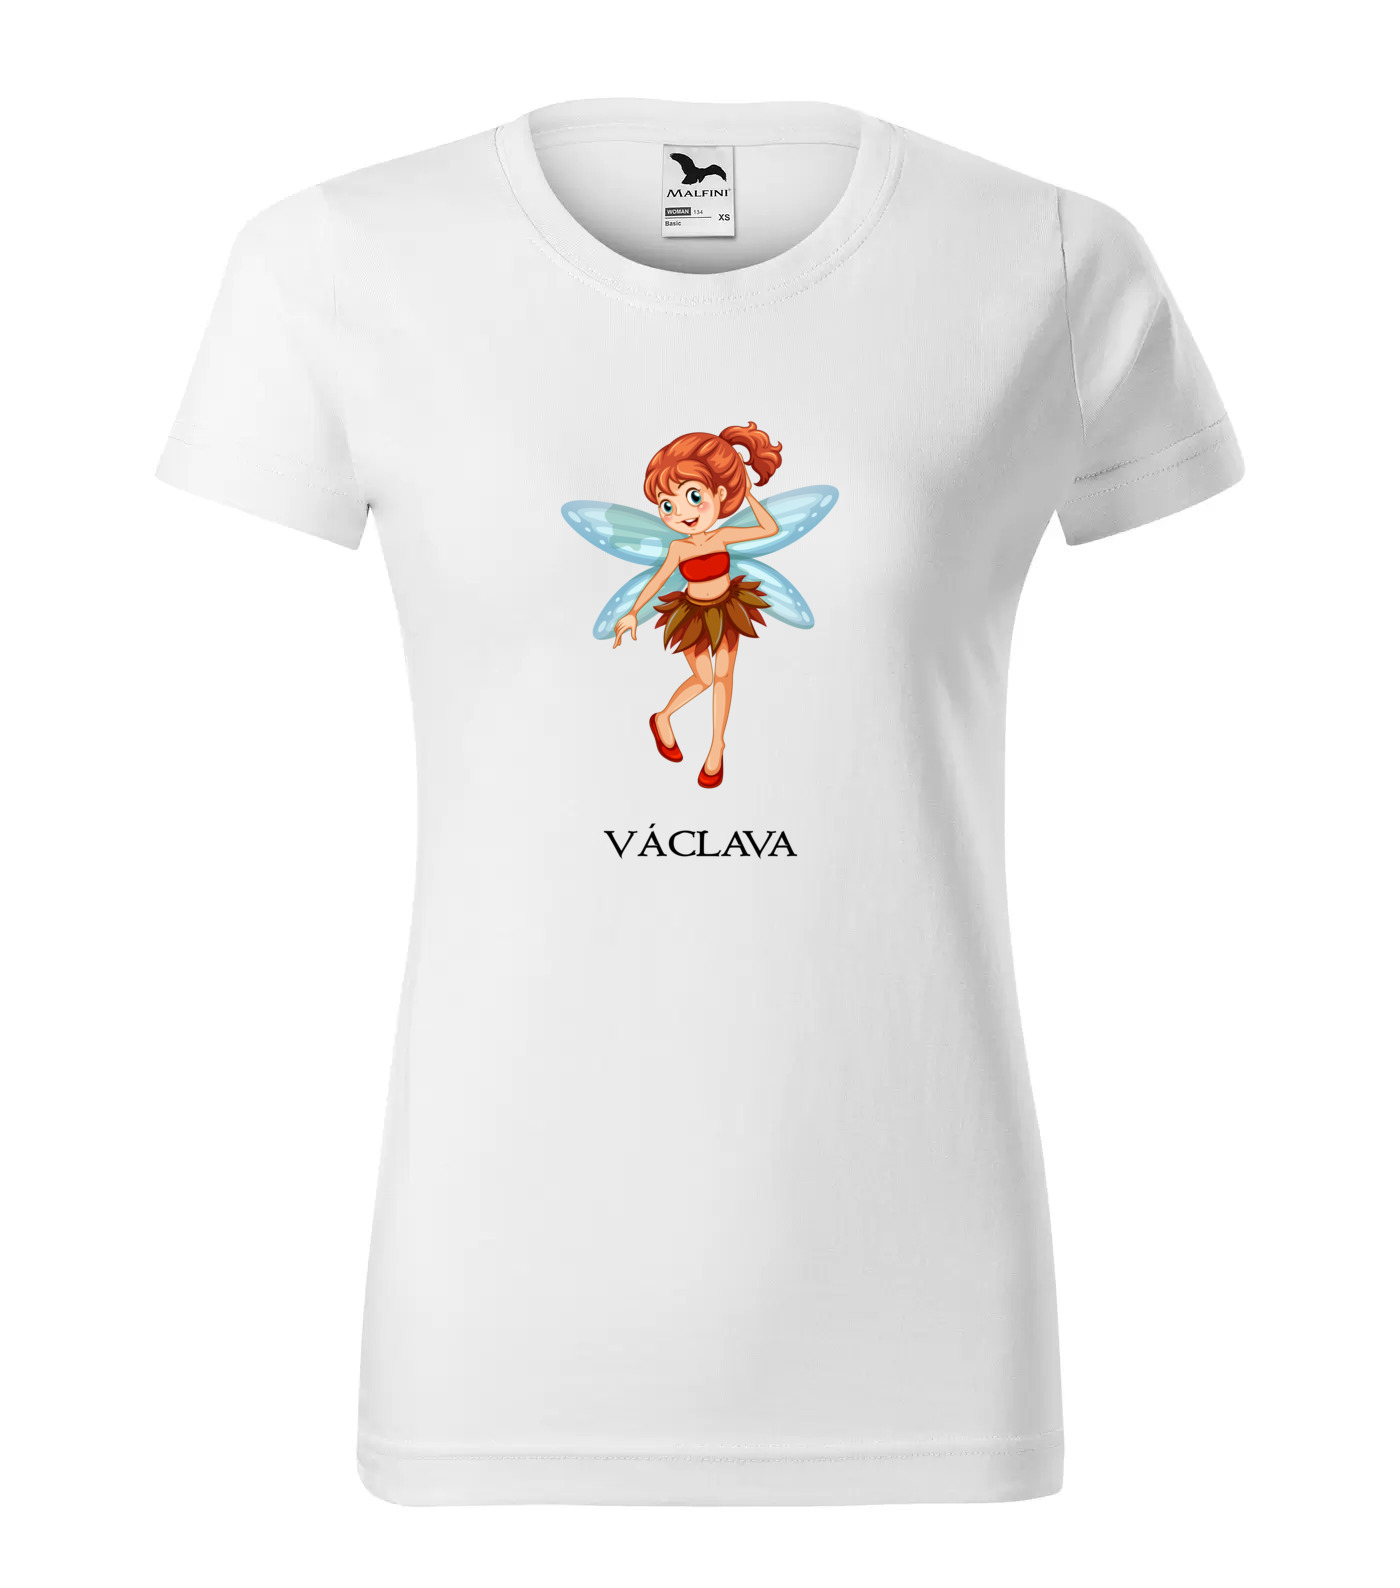 Tričko Víla Václava